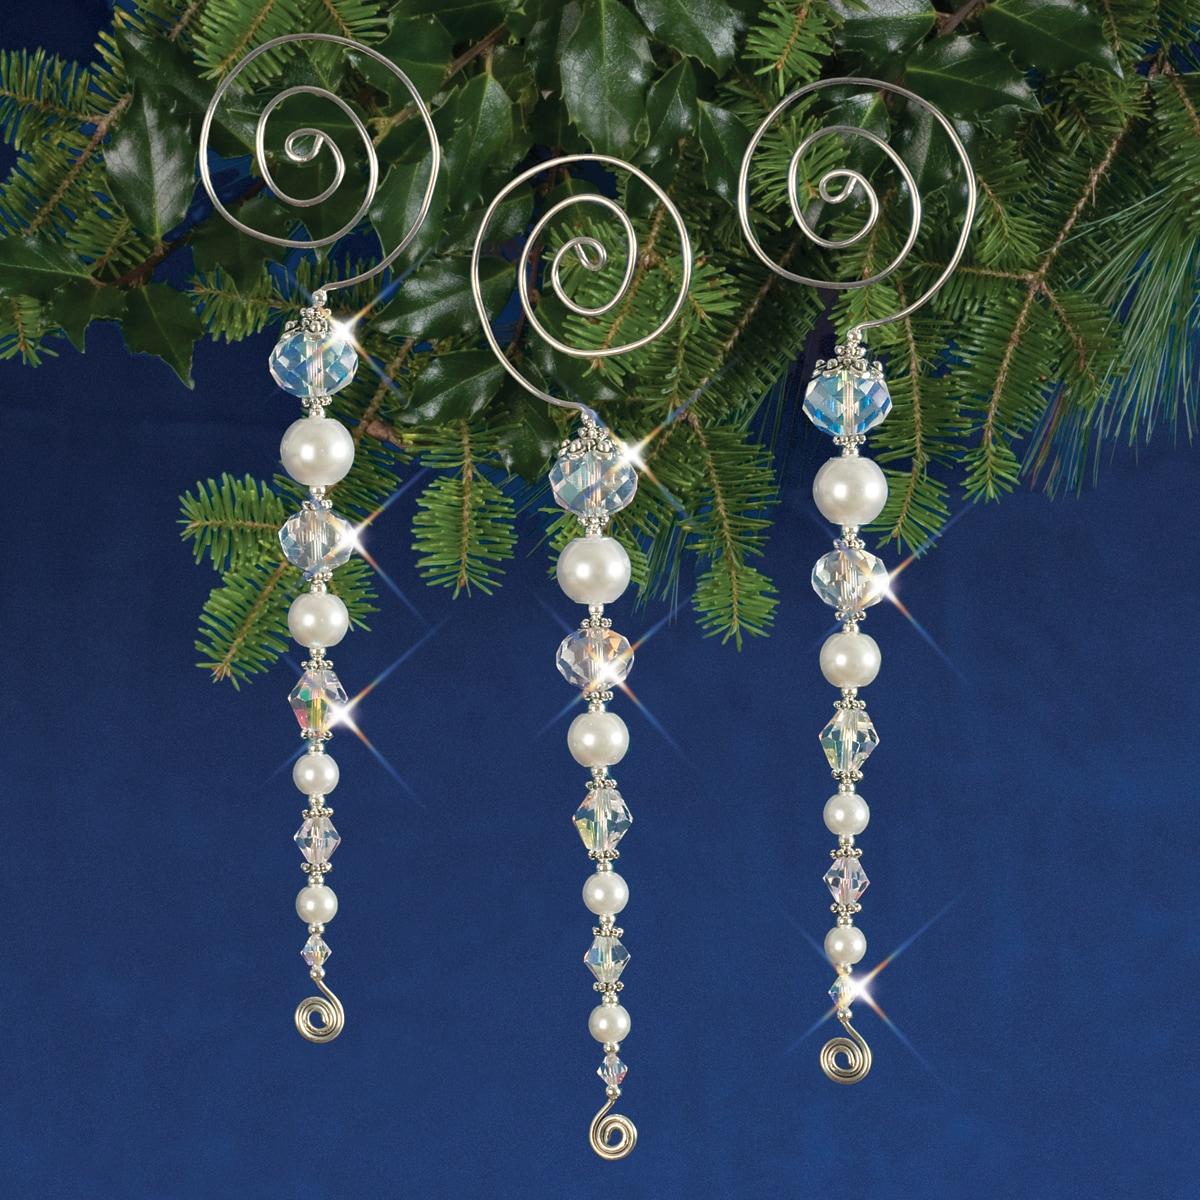 Solid Oak Holiday Beaded Ornament Kit-Vintage Icicles Mak...